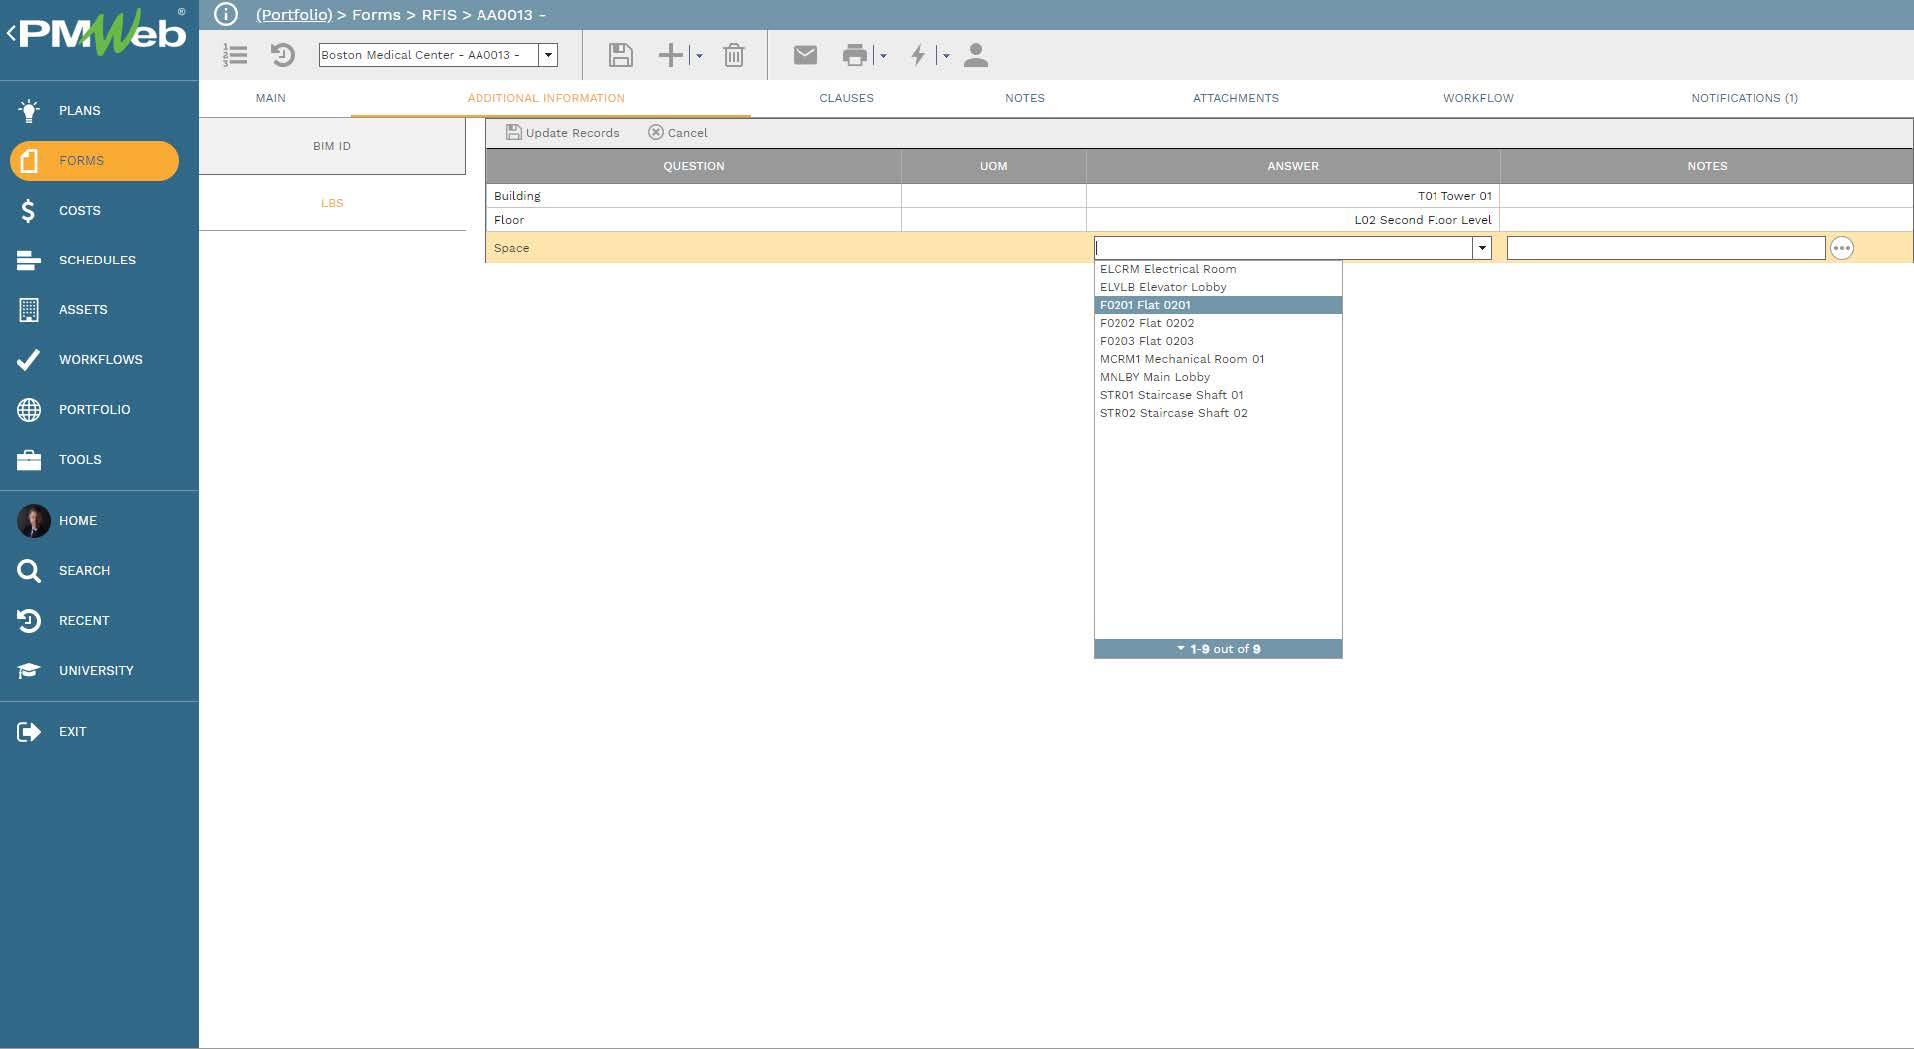 PMWeb 7 Forms RFIs Additional Information